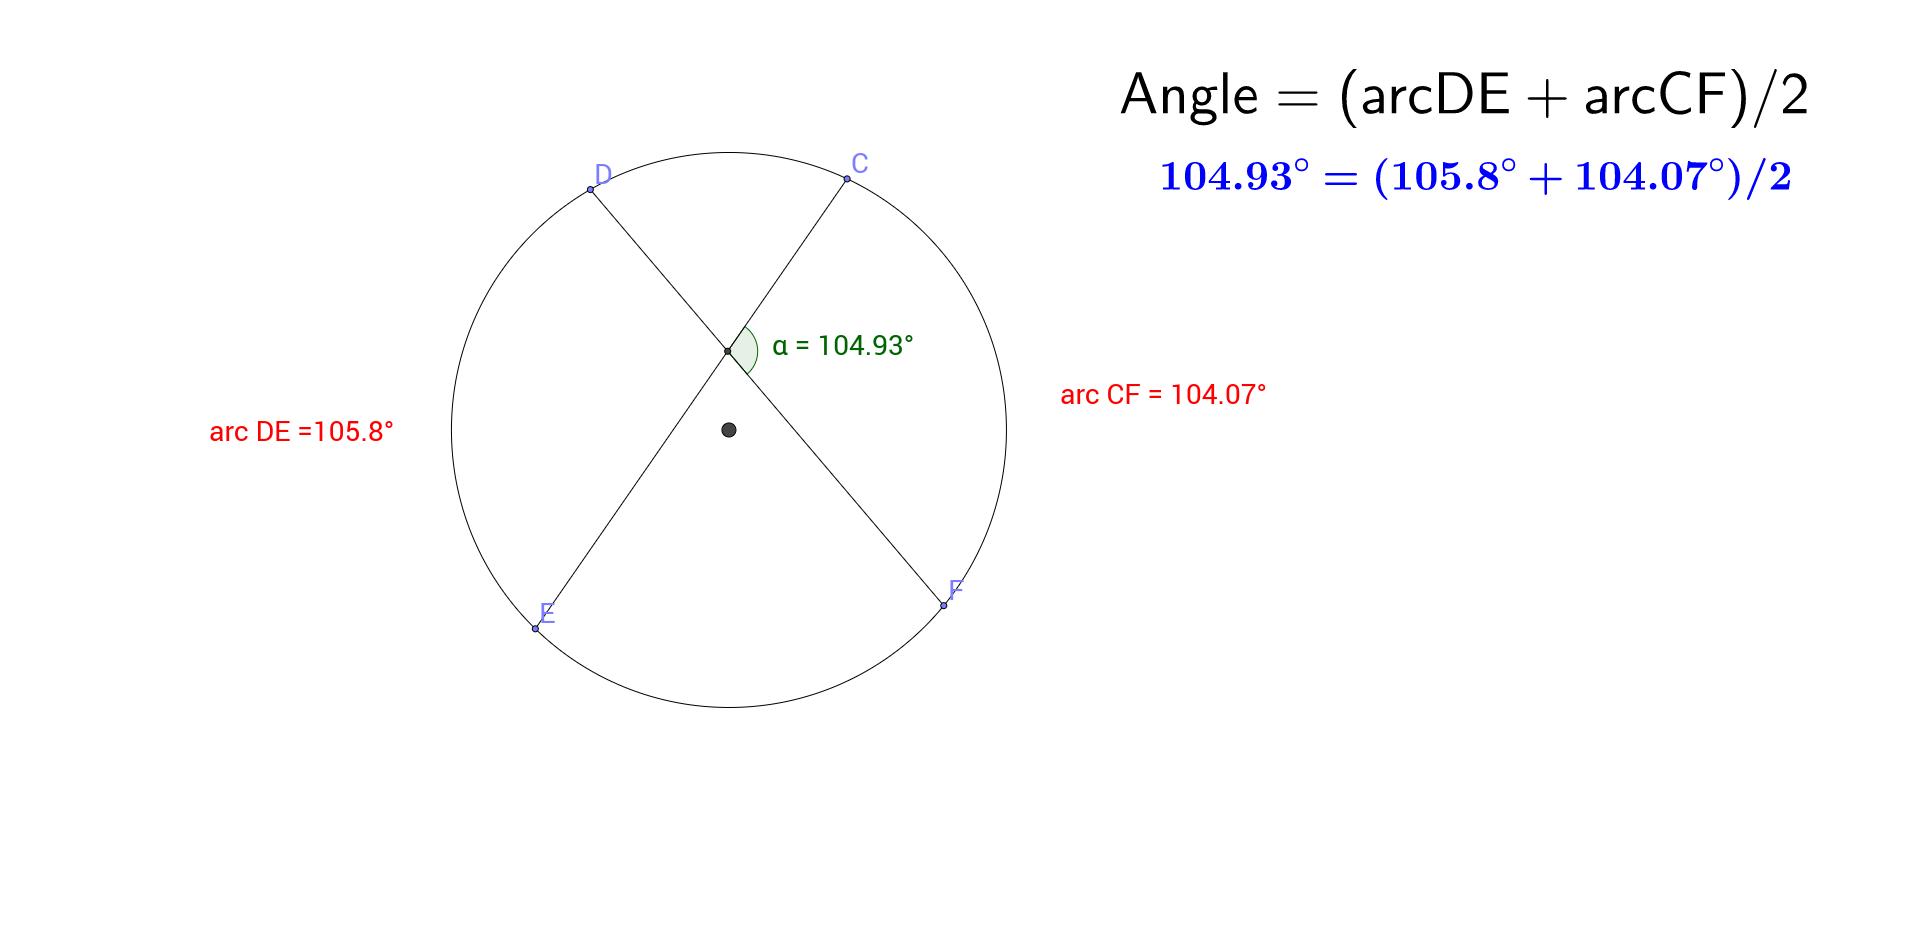 Chord-Chord Angle